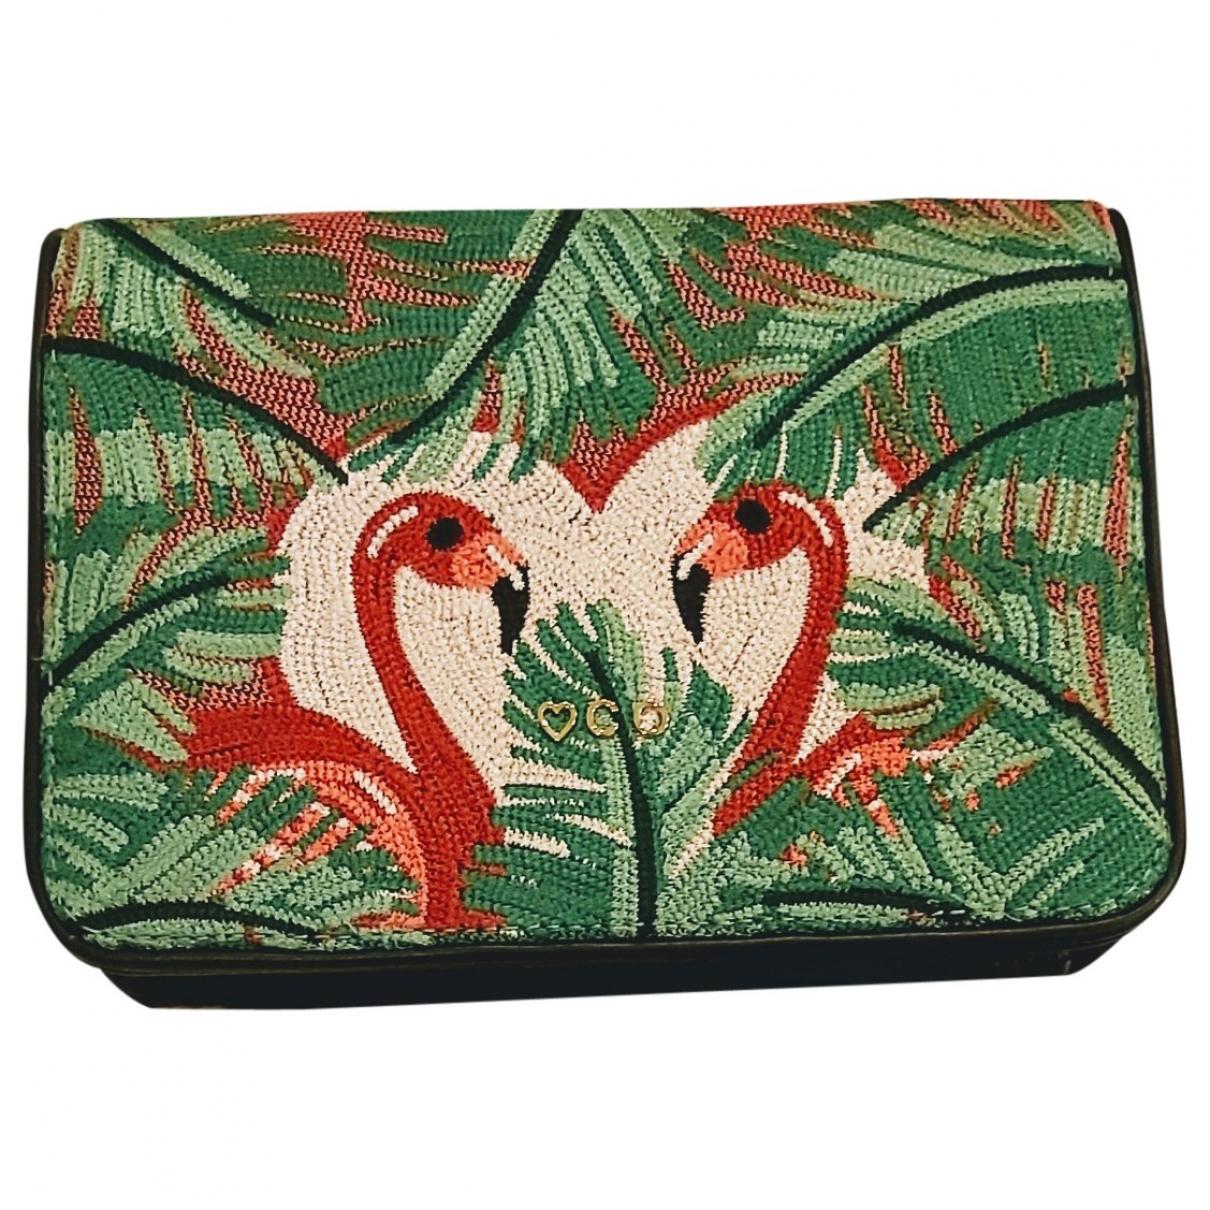 Charlotte Olympia \N Leather Clutch bag for Women \N